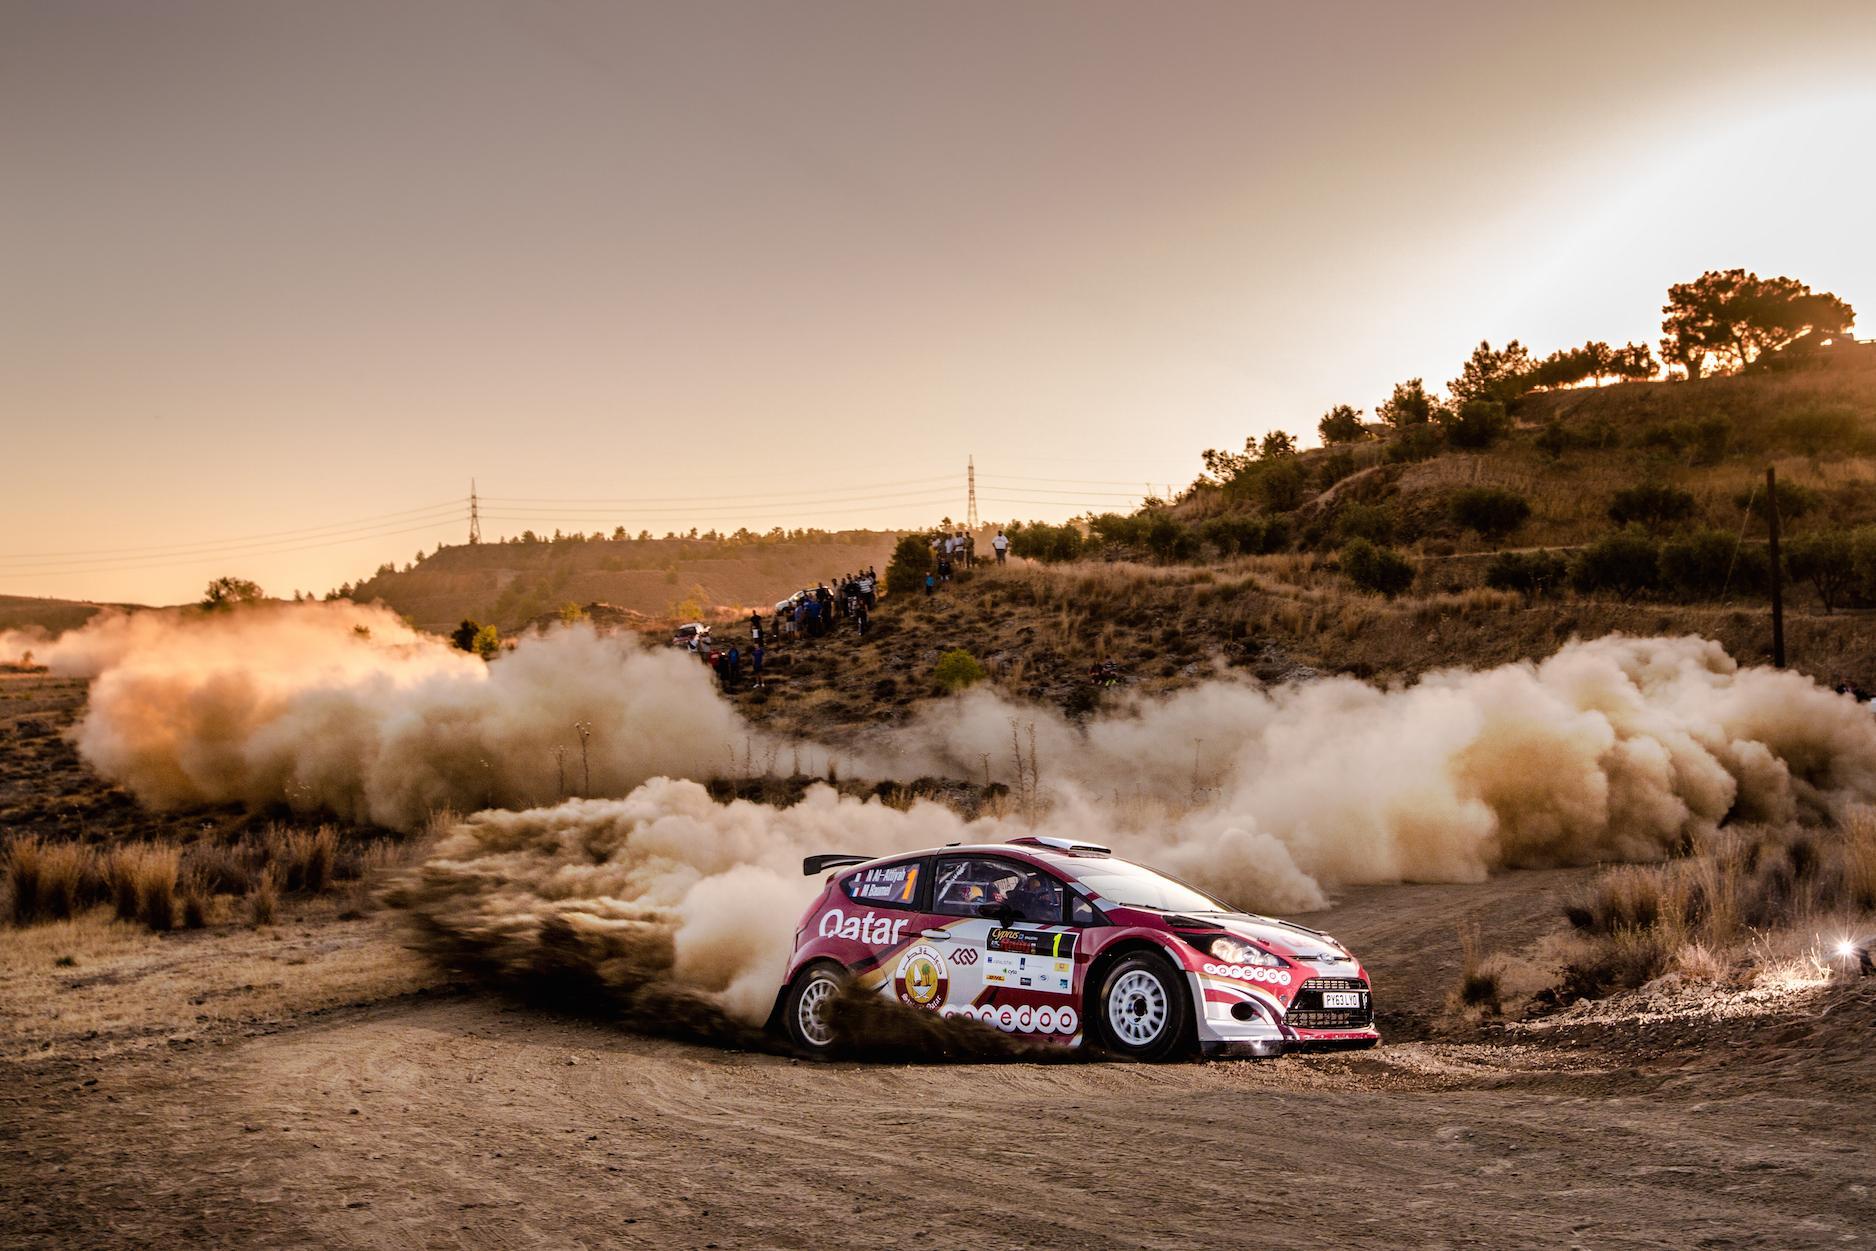 MERC Rally: Al Attiyah edges closer to 11th Championship victory in Jordan